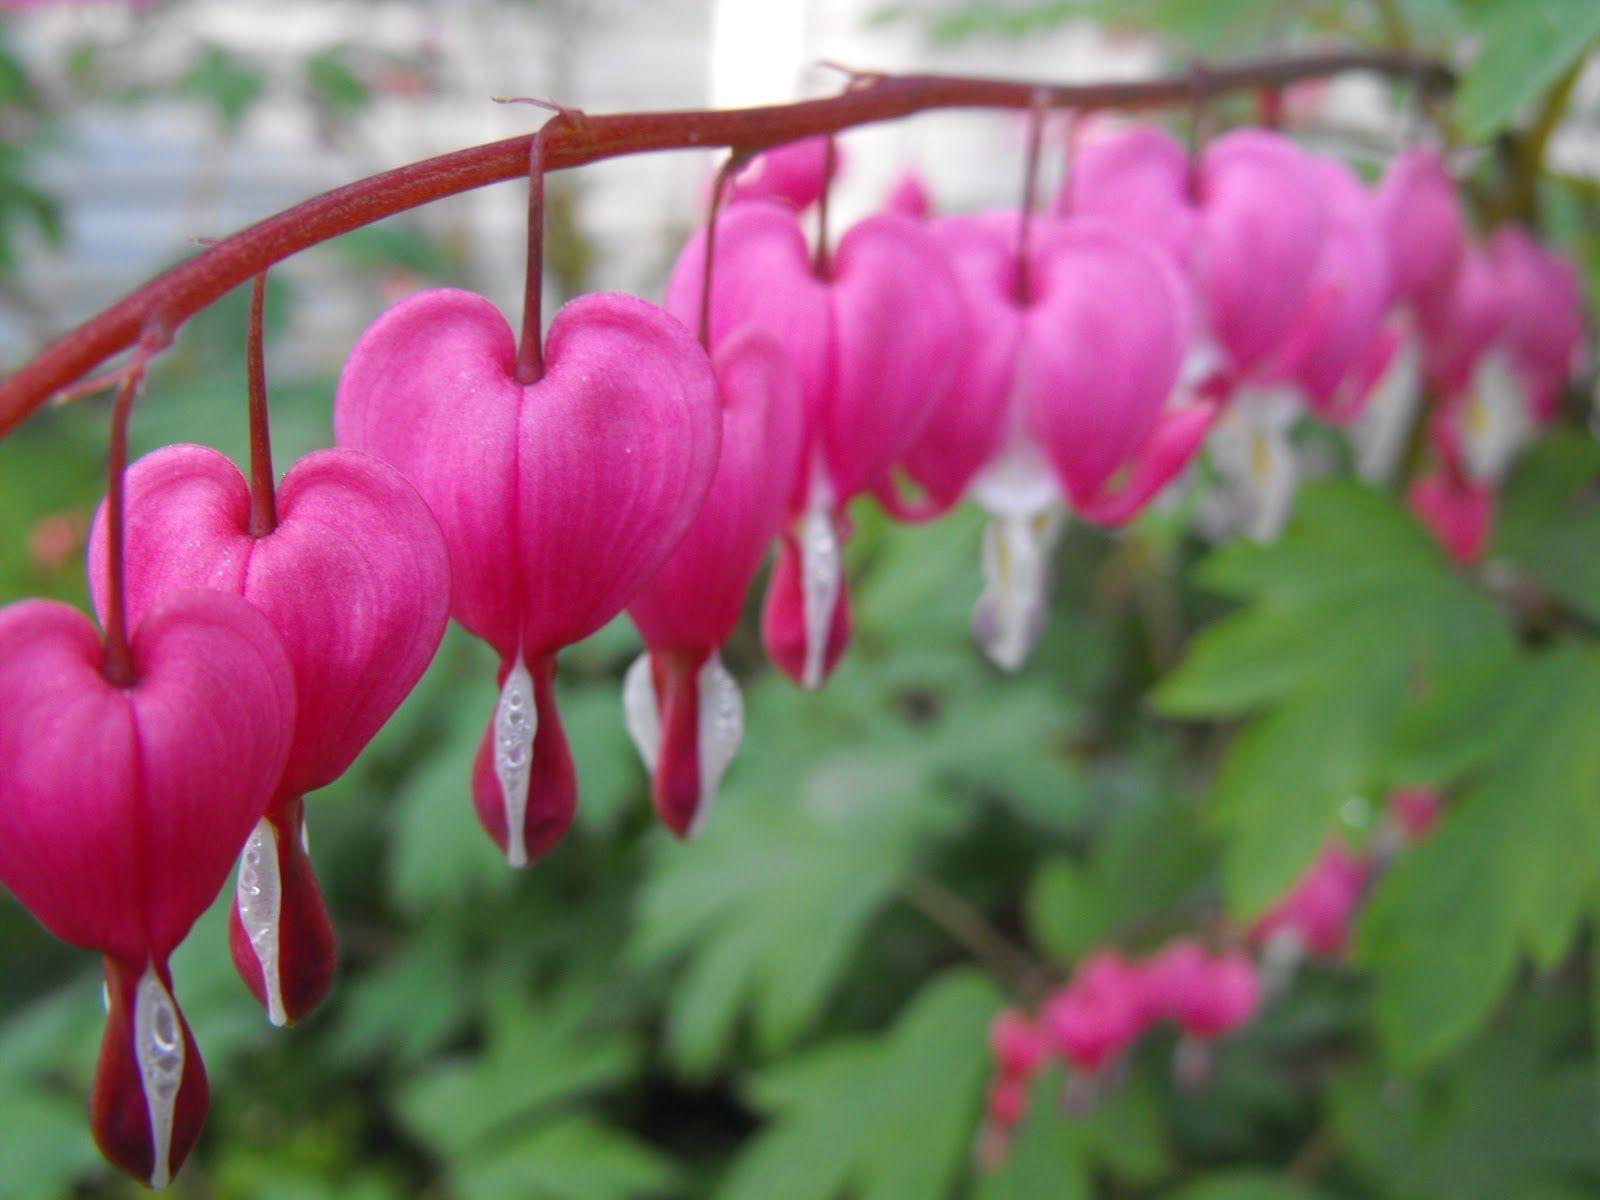 Bleeding Harts Bleeding Heart Flower Bleeding Heart Flower Heart